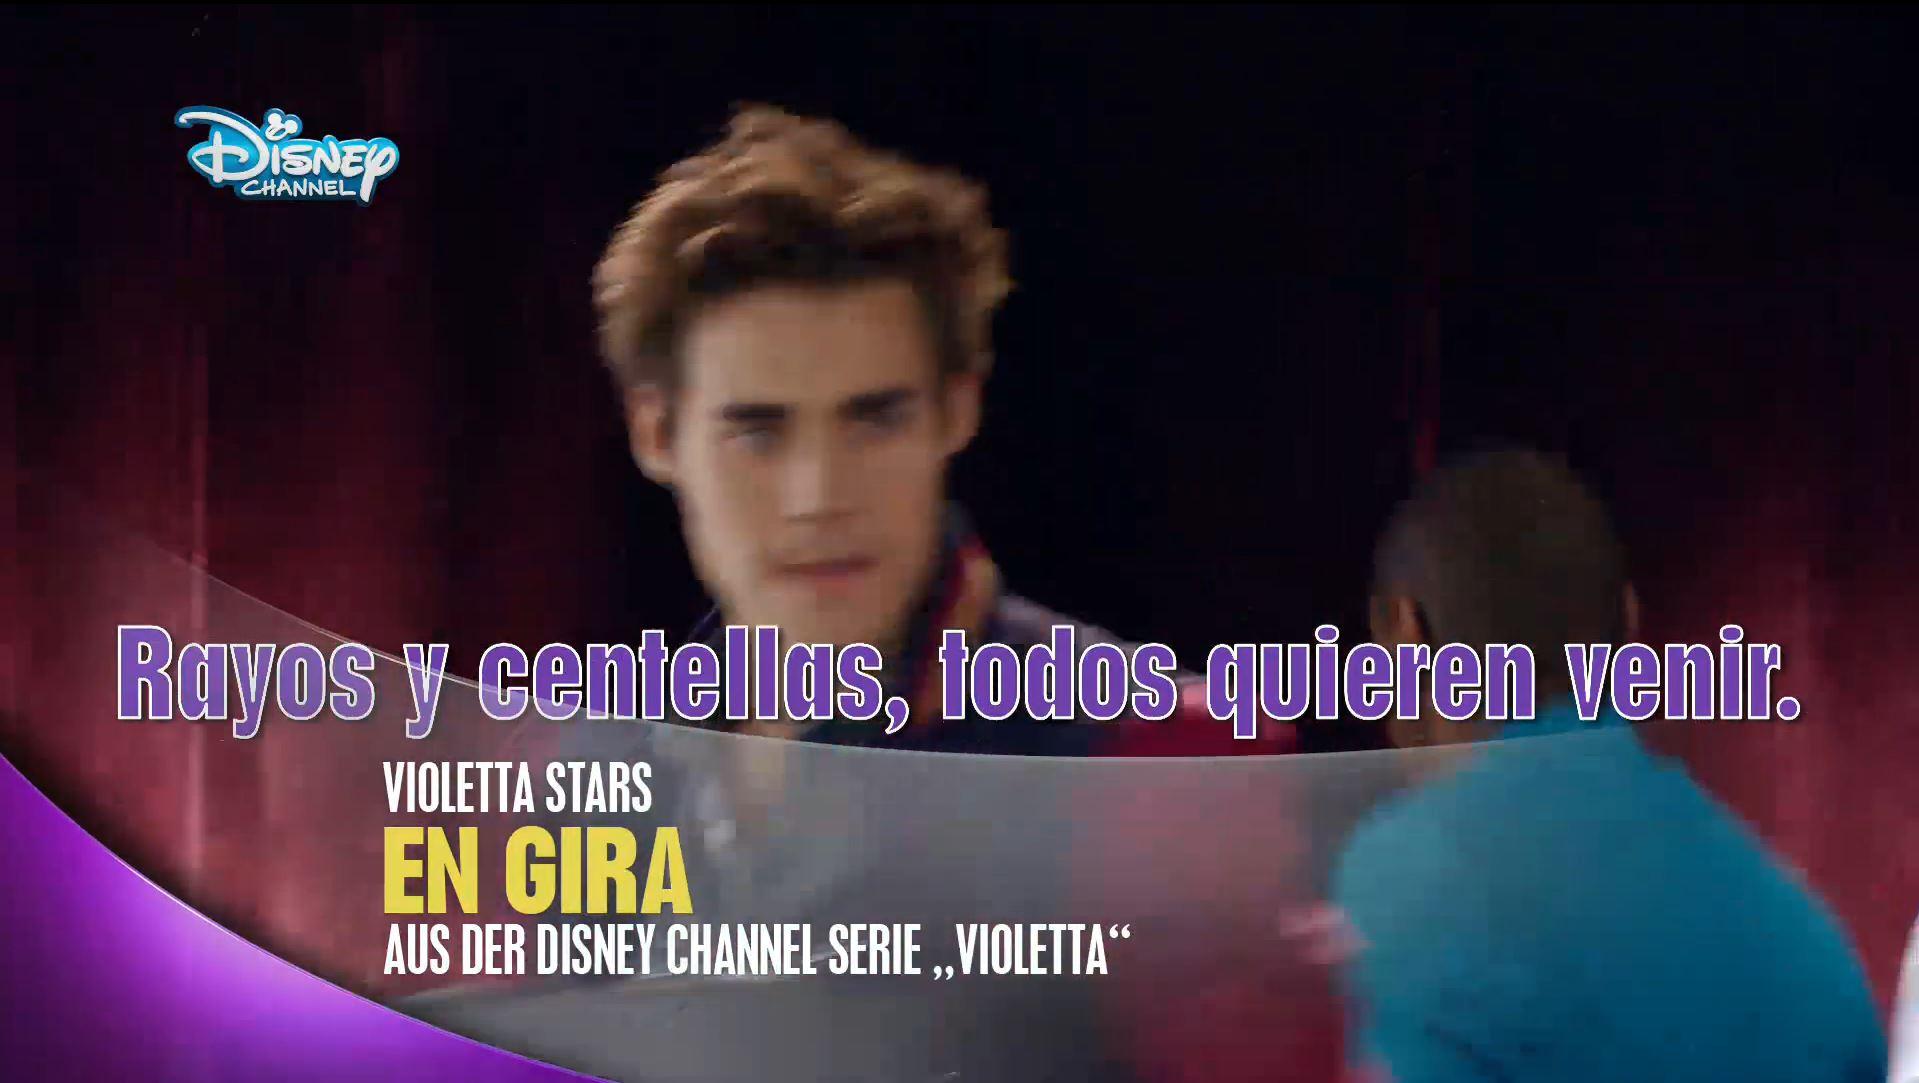 En Gira - Violetta Stars